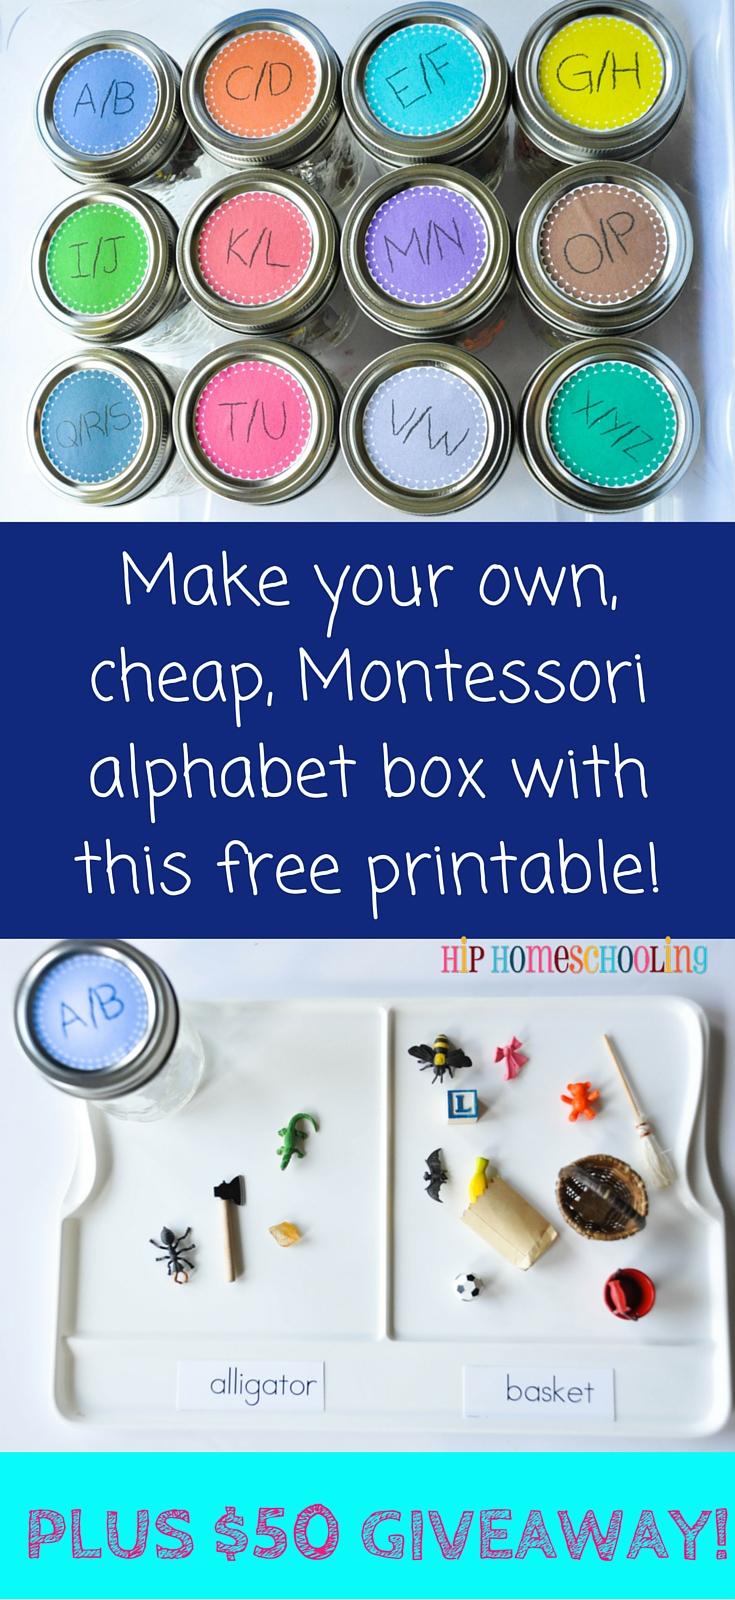 Make your own, cheap, Montessori alphabet box with this free printable! Plus #entertowin a $50 gift card from @montessoriserv #montessoriservices #montessori #alphabetbox #freeprintable